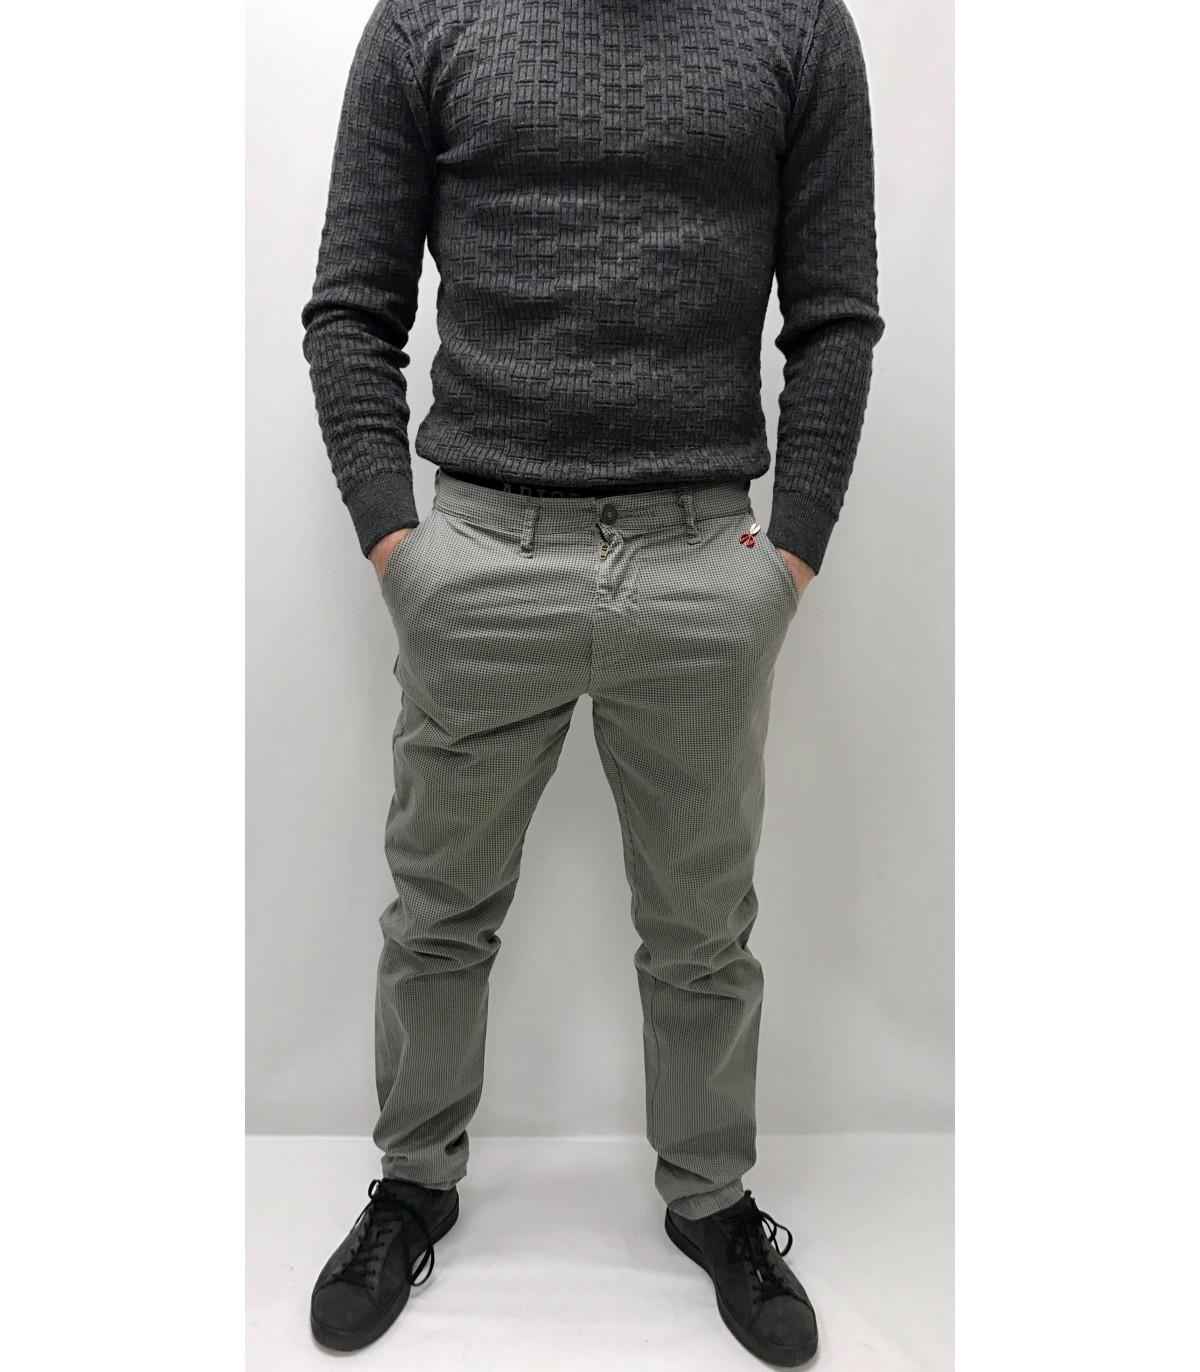 comprar online 098a6 f1f38 Pantalon Gris Imperial - Sauvage Concept Store